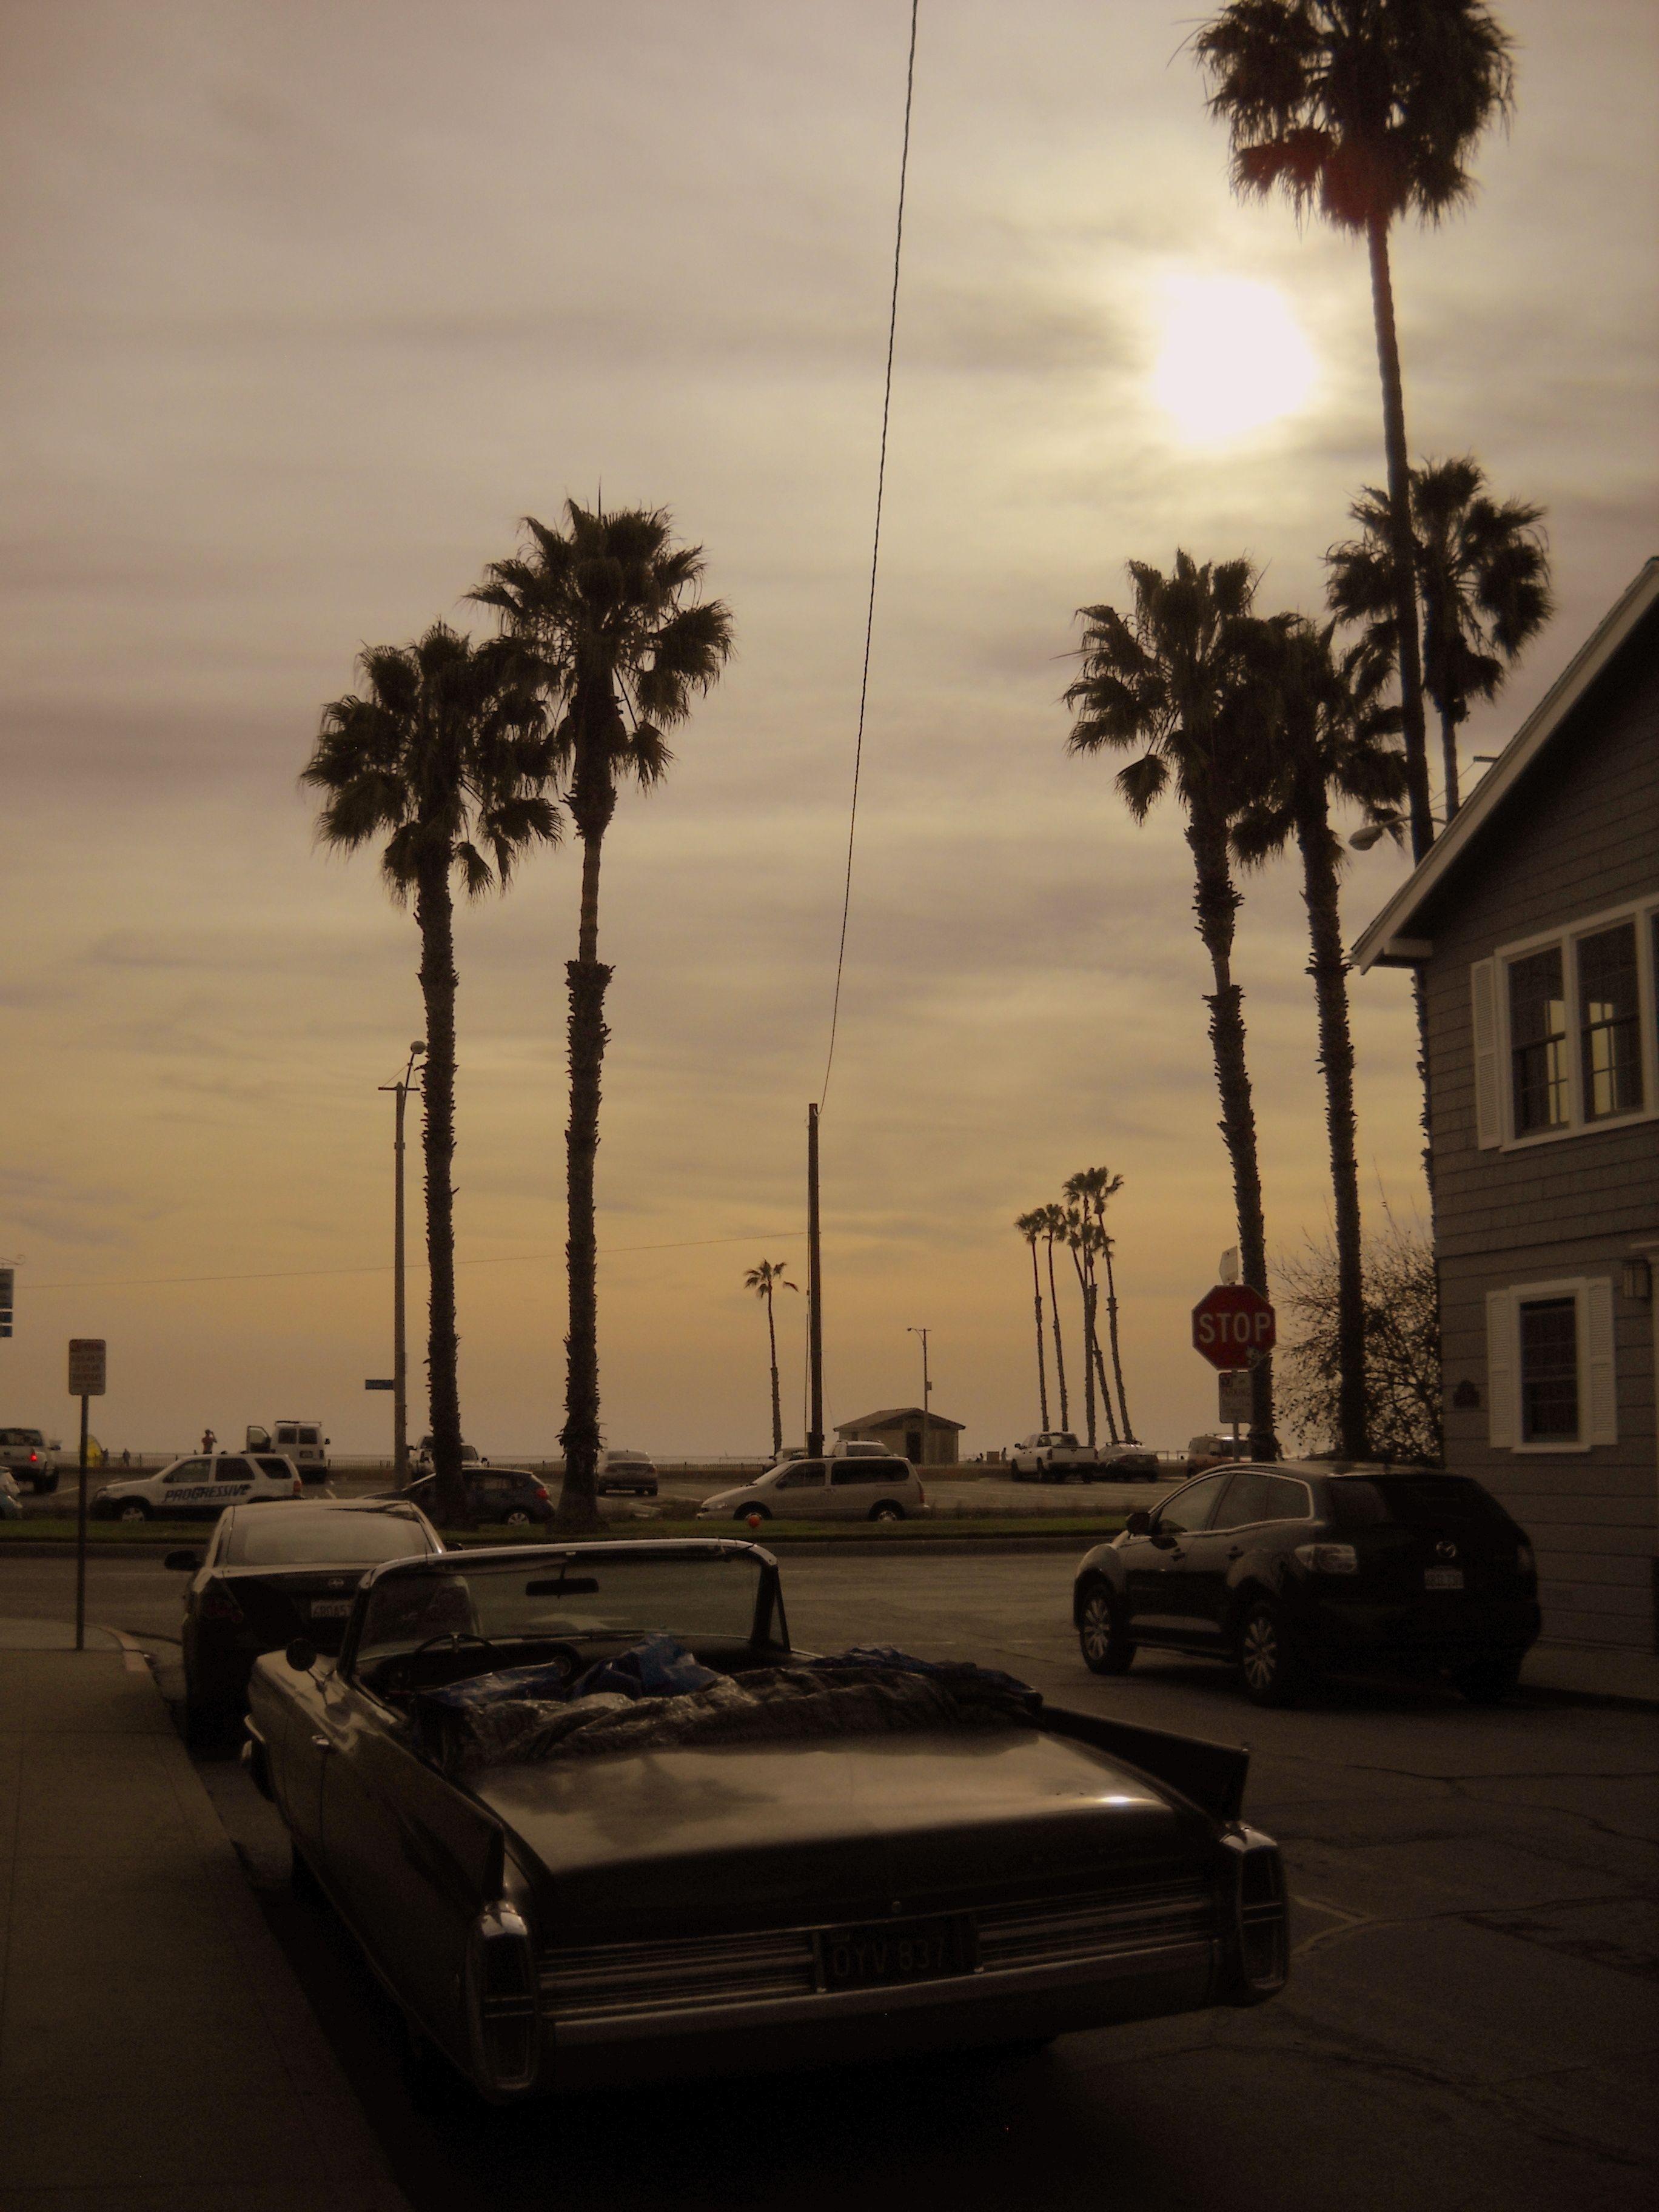 Naples Island Long Beach Ca Palms Old Car Sunset Just Another Piece Of Americana Long Beach California Long Beach Sunset